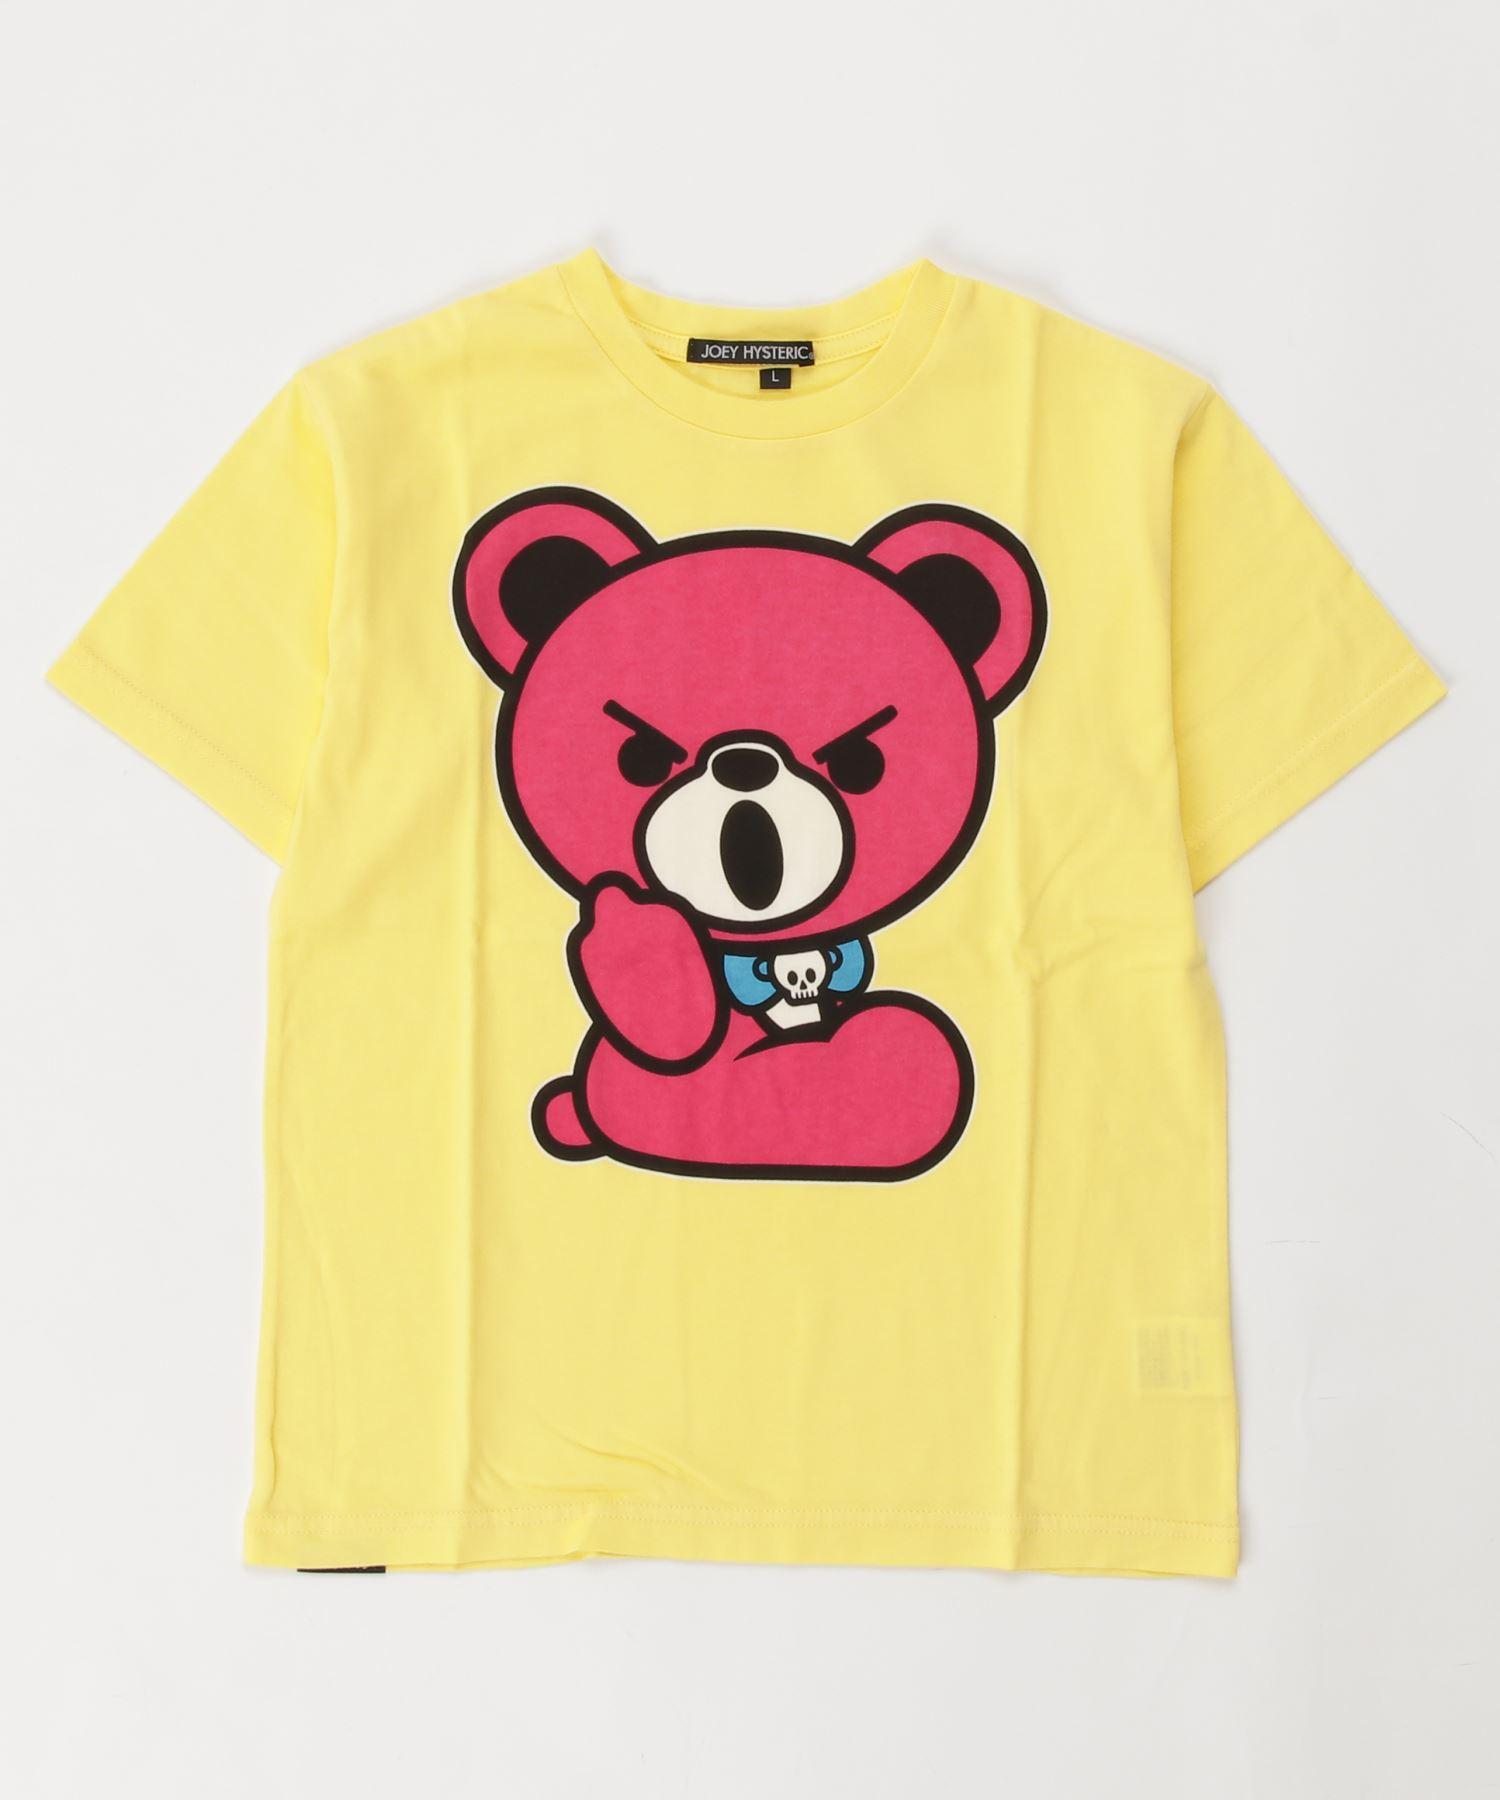 HELLO BEAR pt Tシャツ【L】